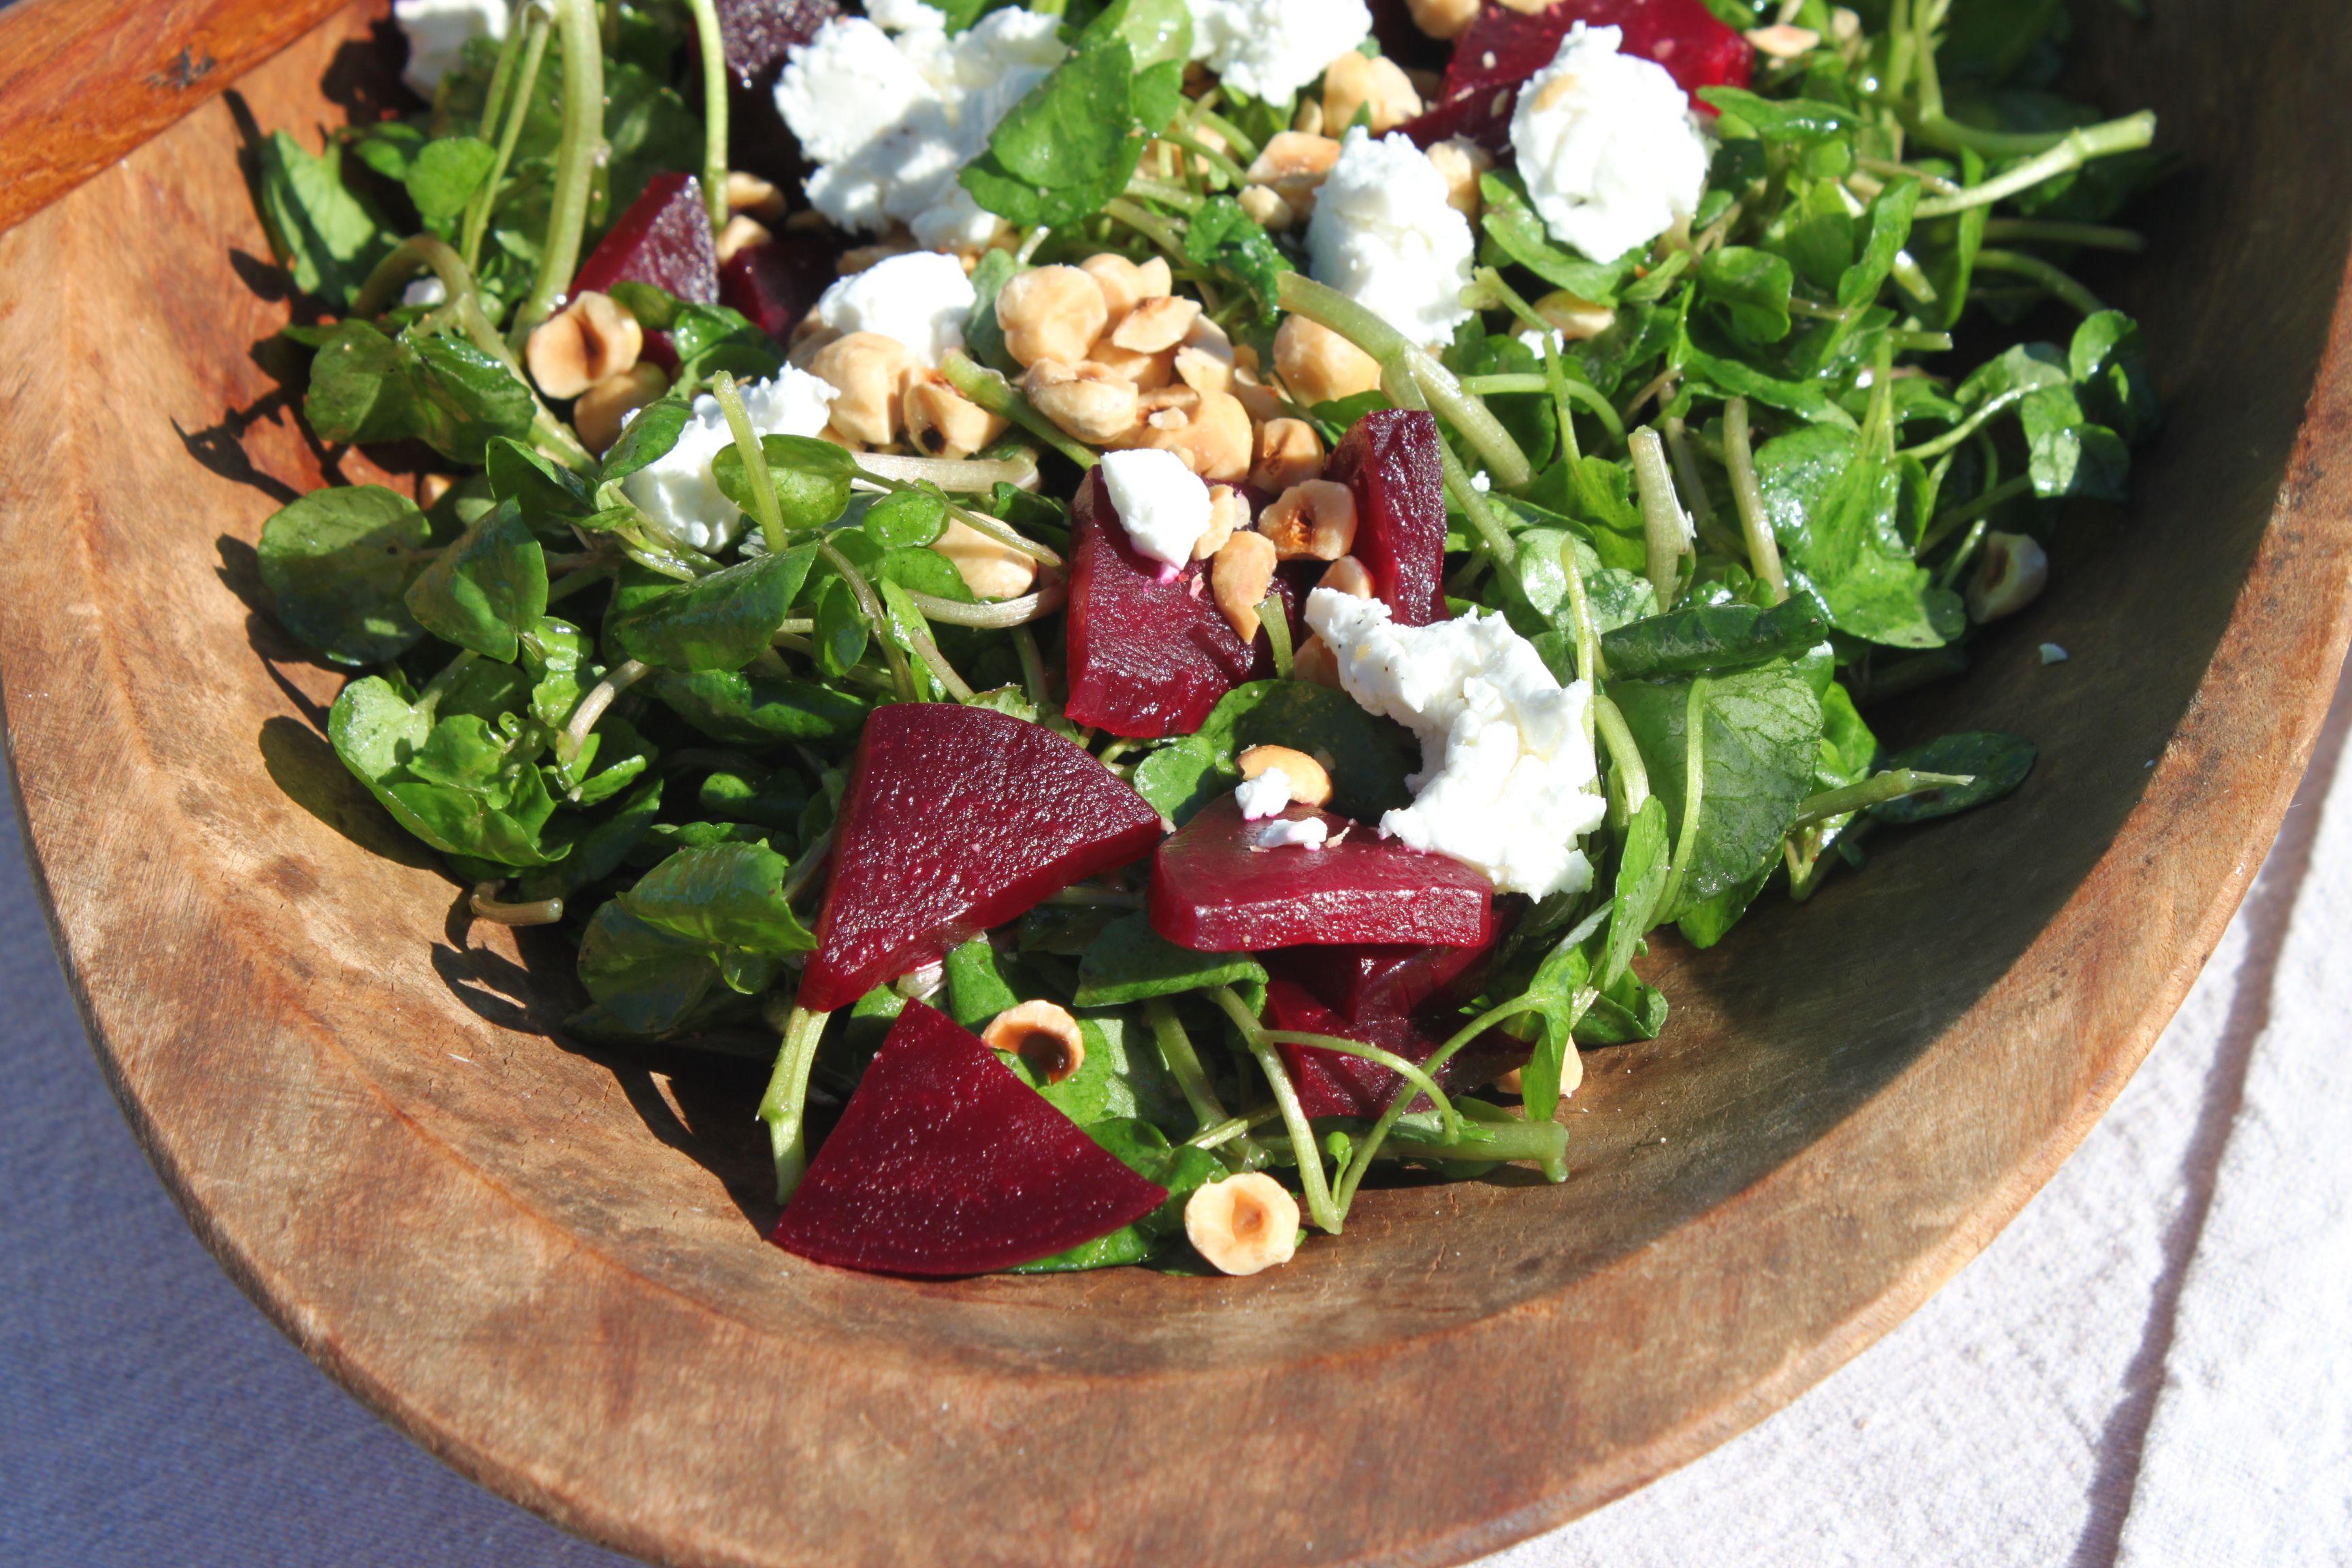 Sausalito Springs Watercress & Beet Salad